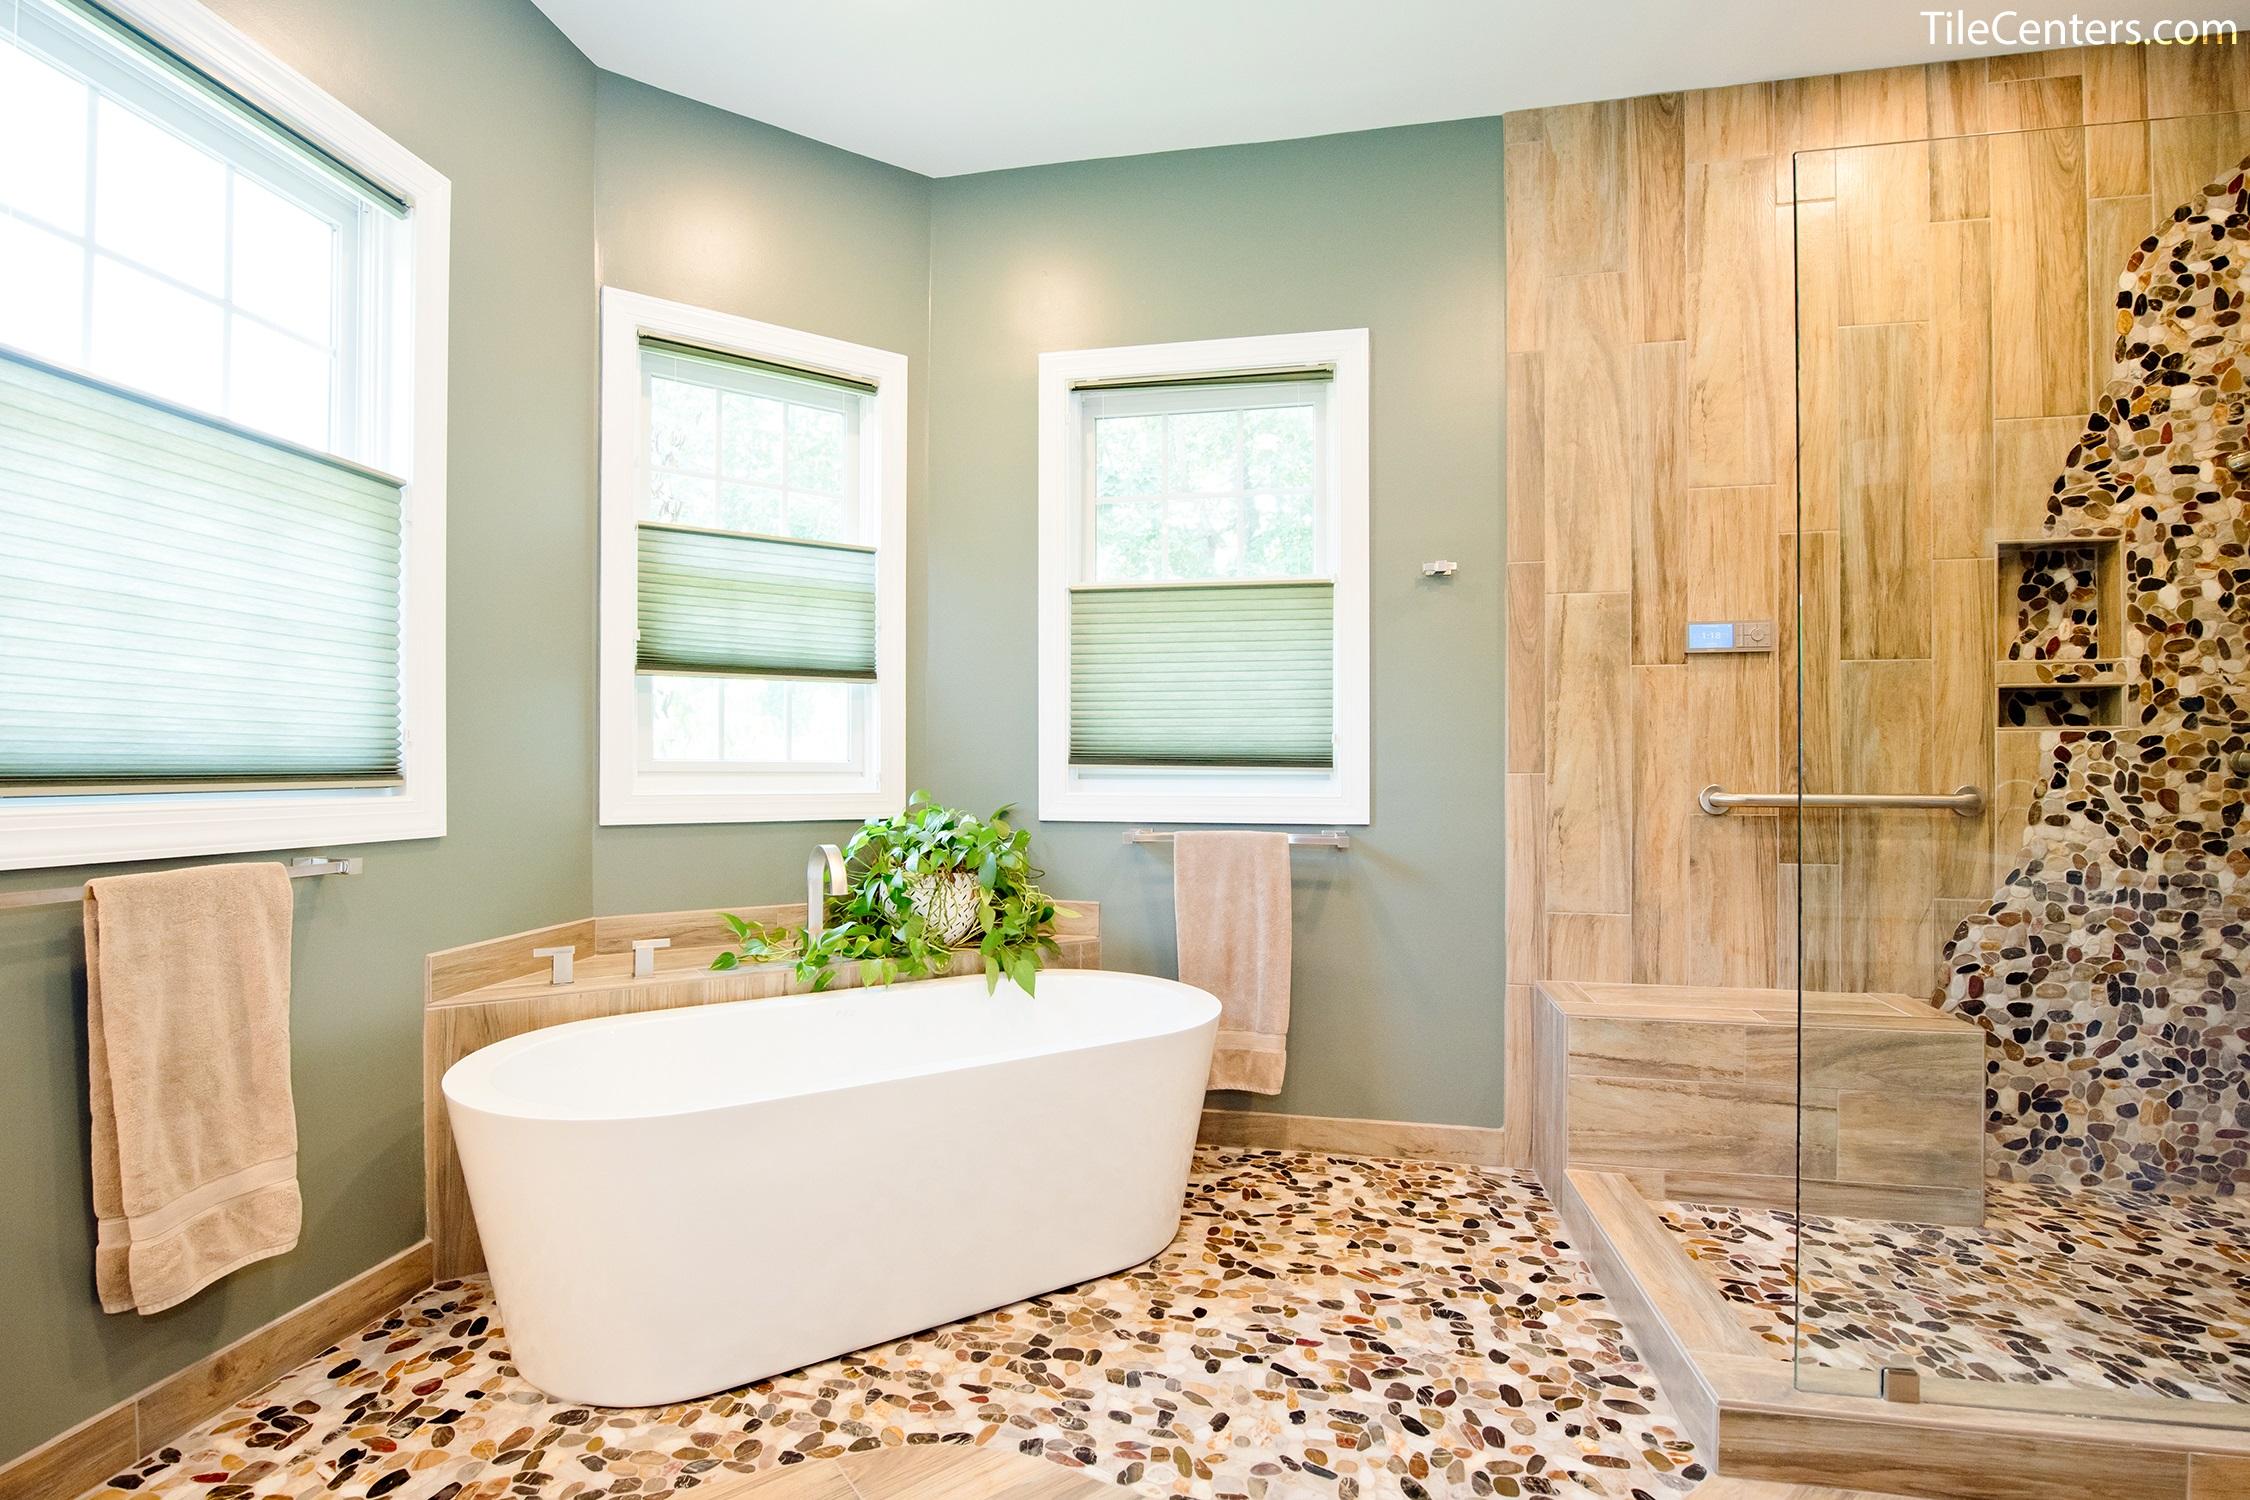 Natural Master Bathroom Remodel - Gallery & Design Ideas